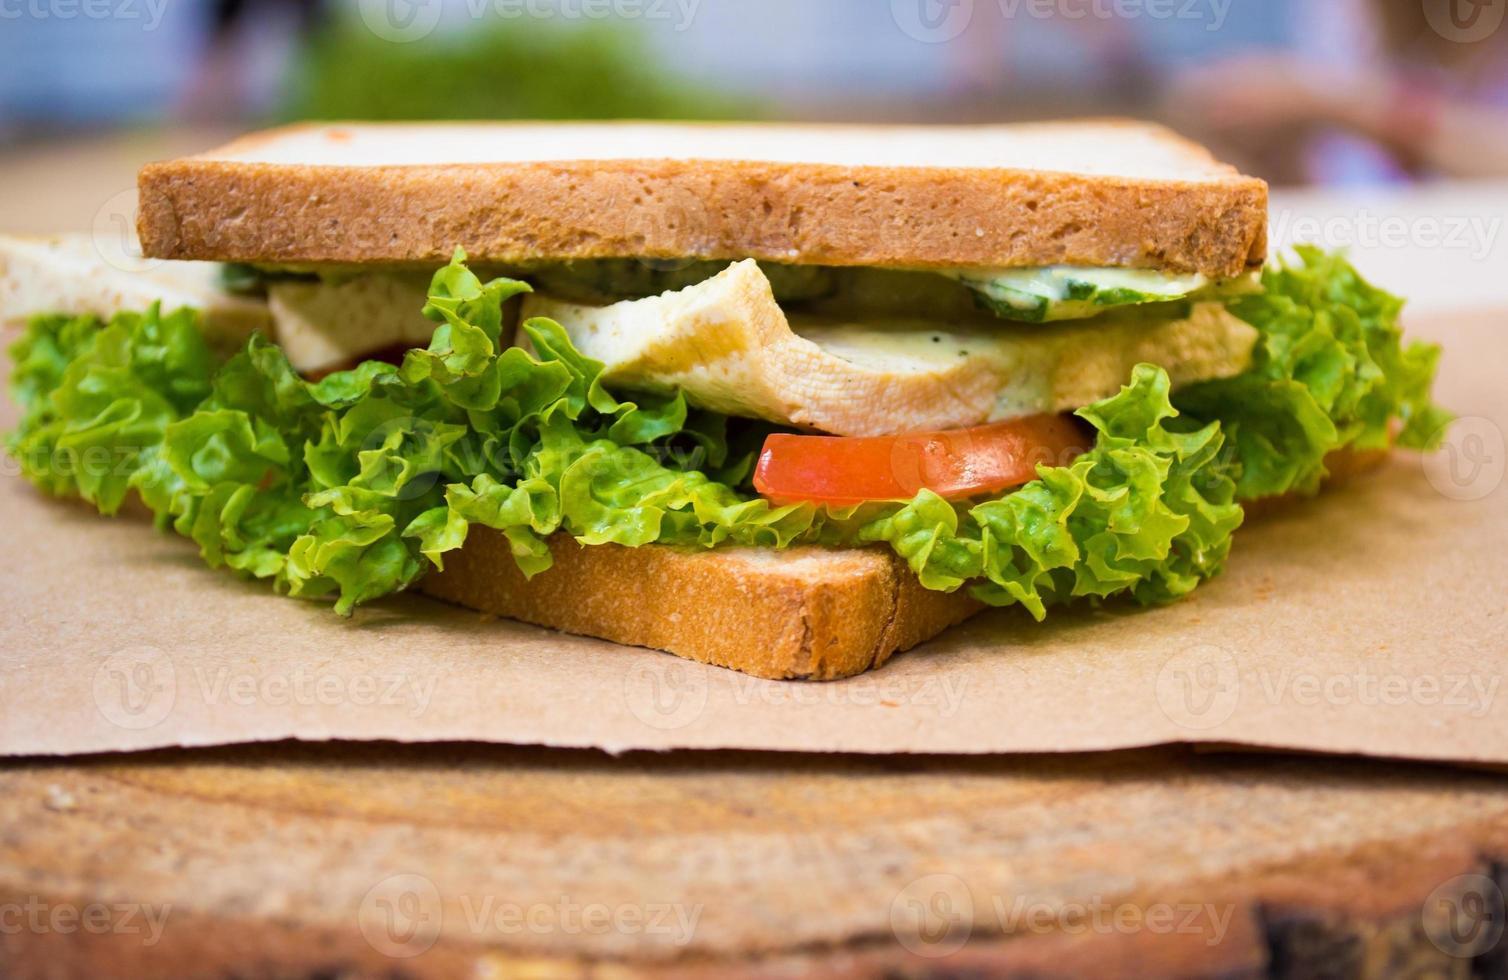 Vegan sandwitch with tofu photo